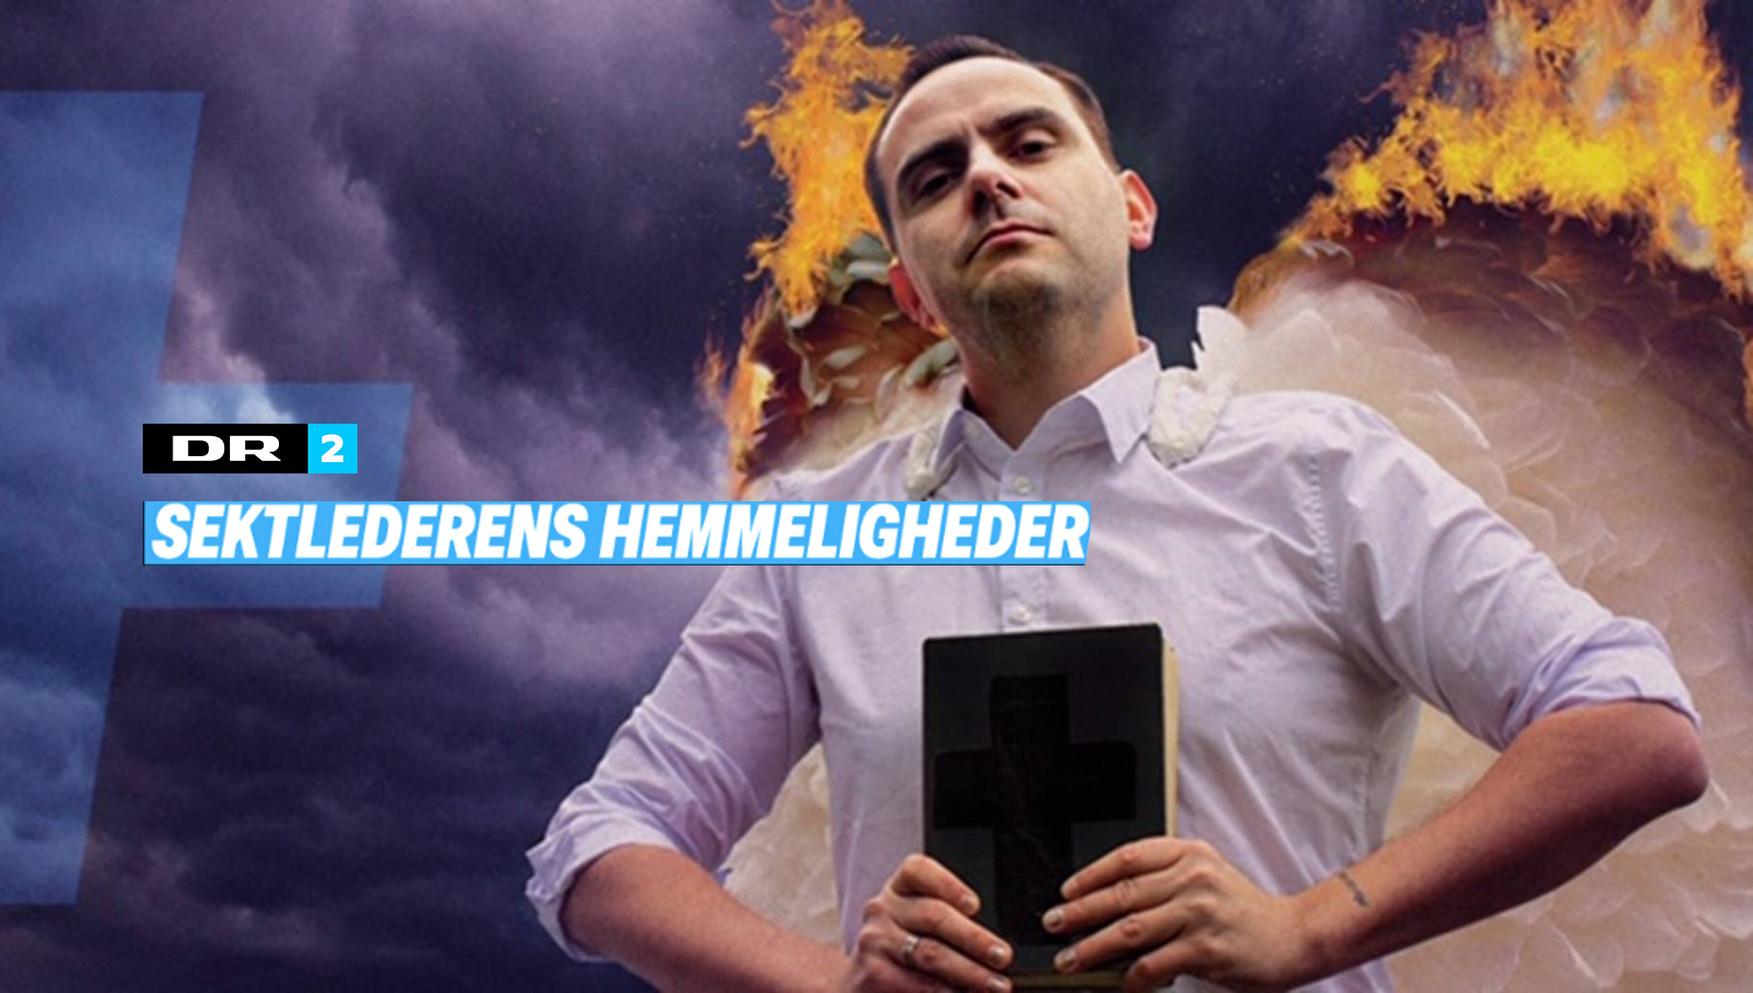 Sektlederens Hemmeligheder programfoto.j